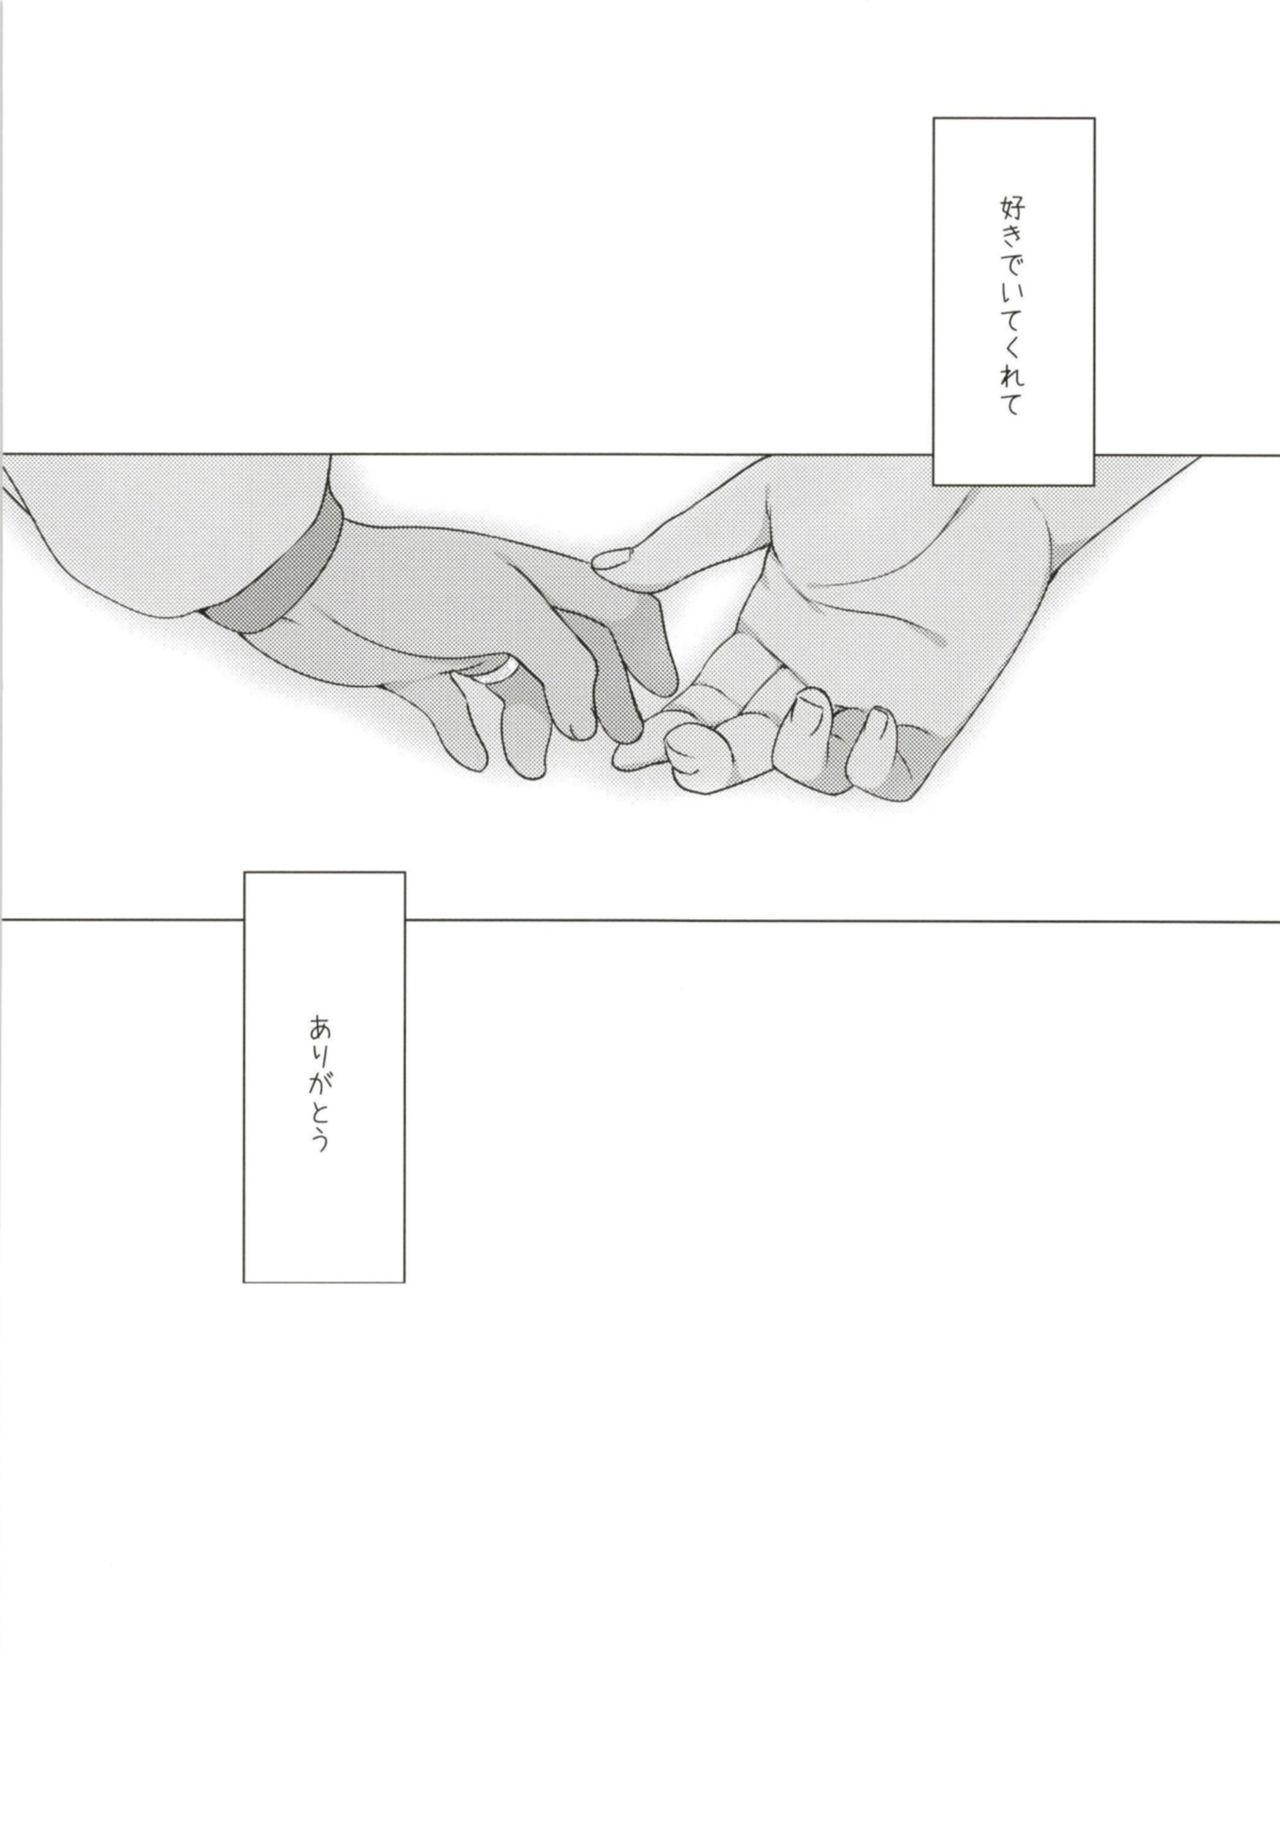 [French letter (Fujisaki Hikari)] Hitonatsu no Ayamachi -I-401 Soushuuhen- (Kantai Collection -KanColle-) [Digital] 85